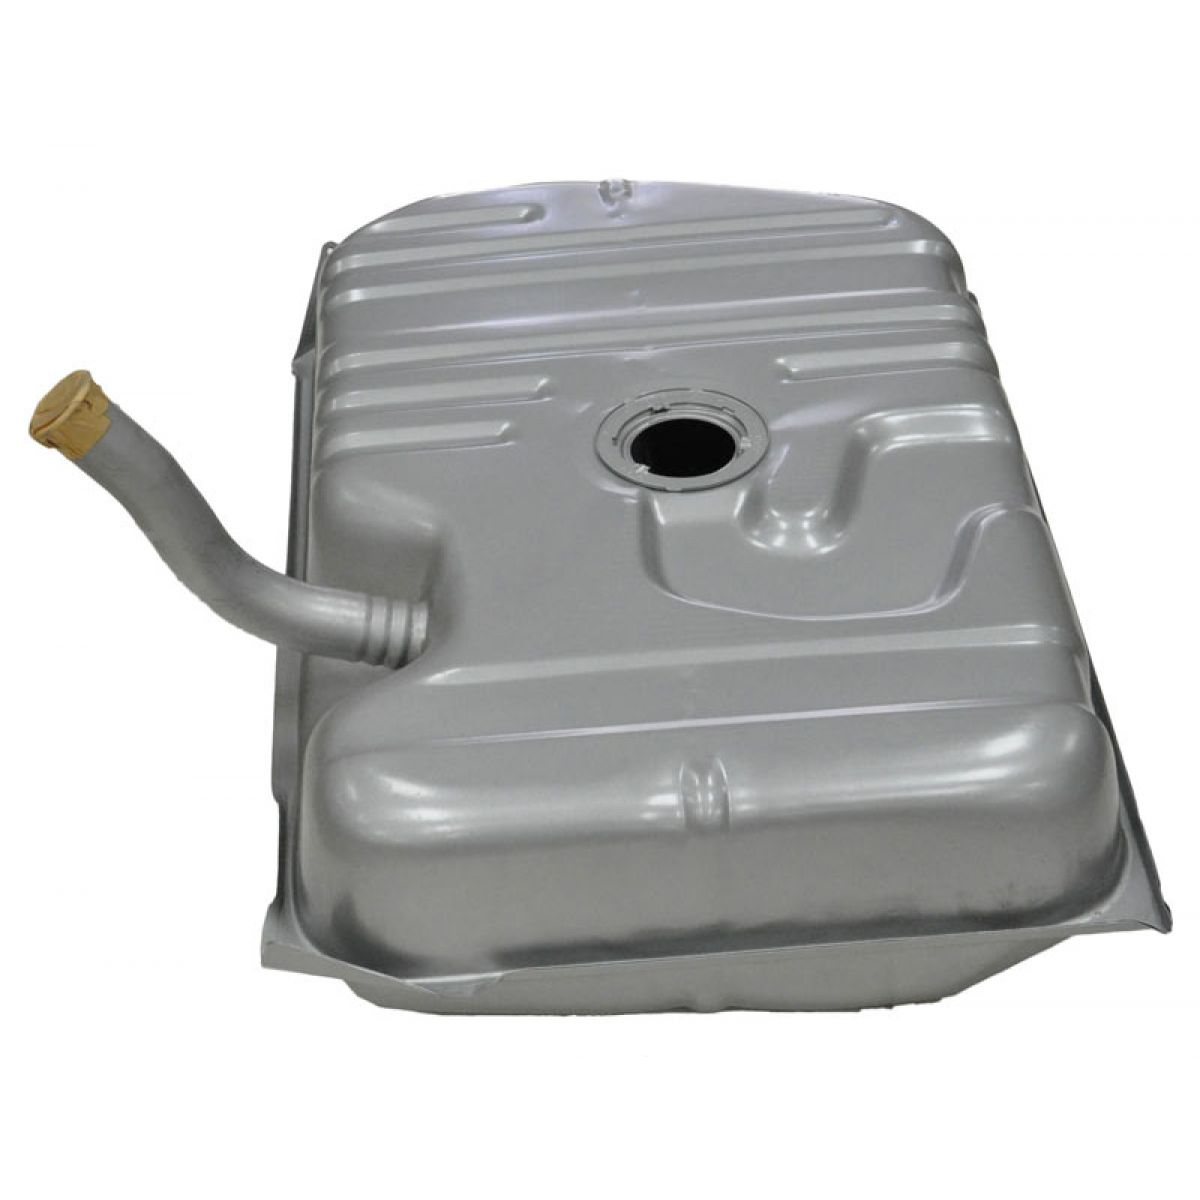 17 Gallon Gas Fuel Tank for Pontiac Grand Prix Chevy Malibu